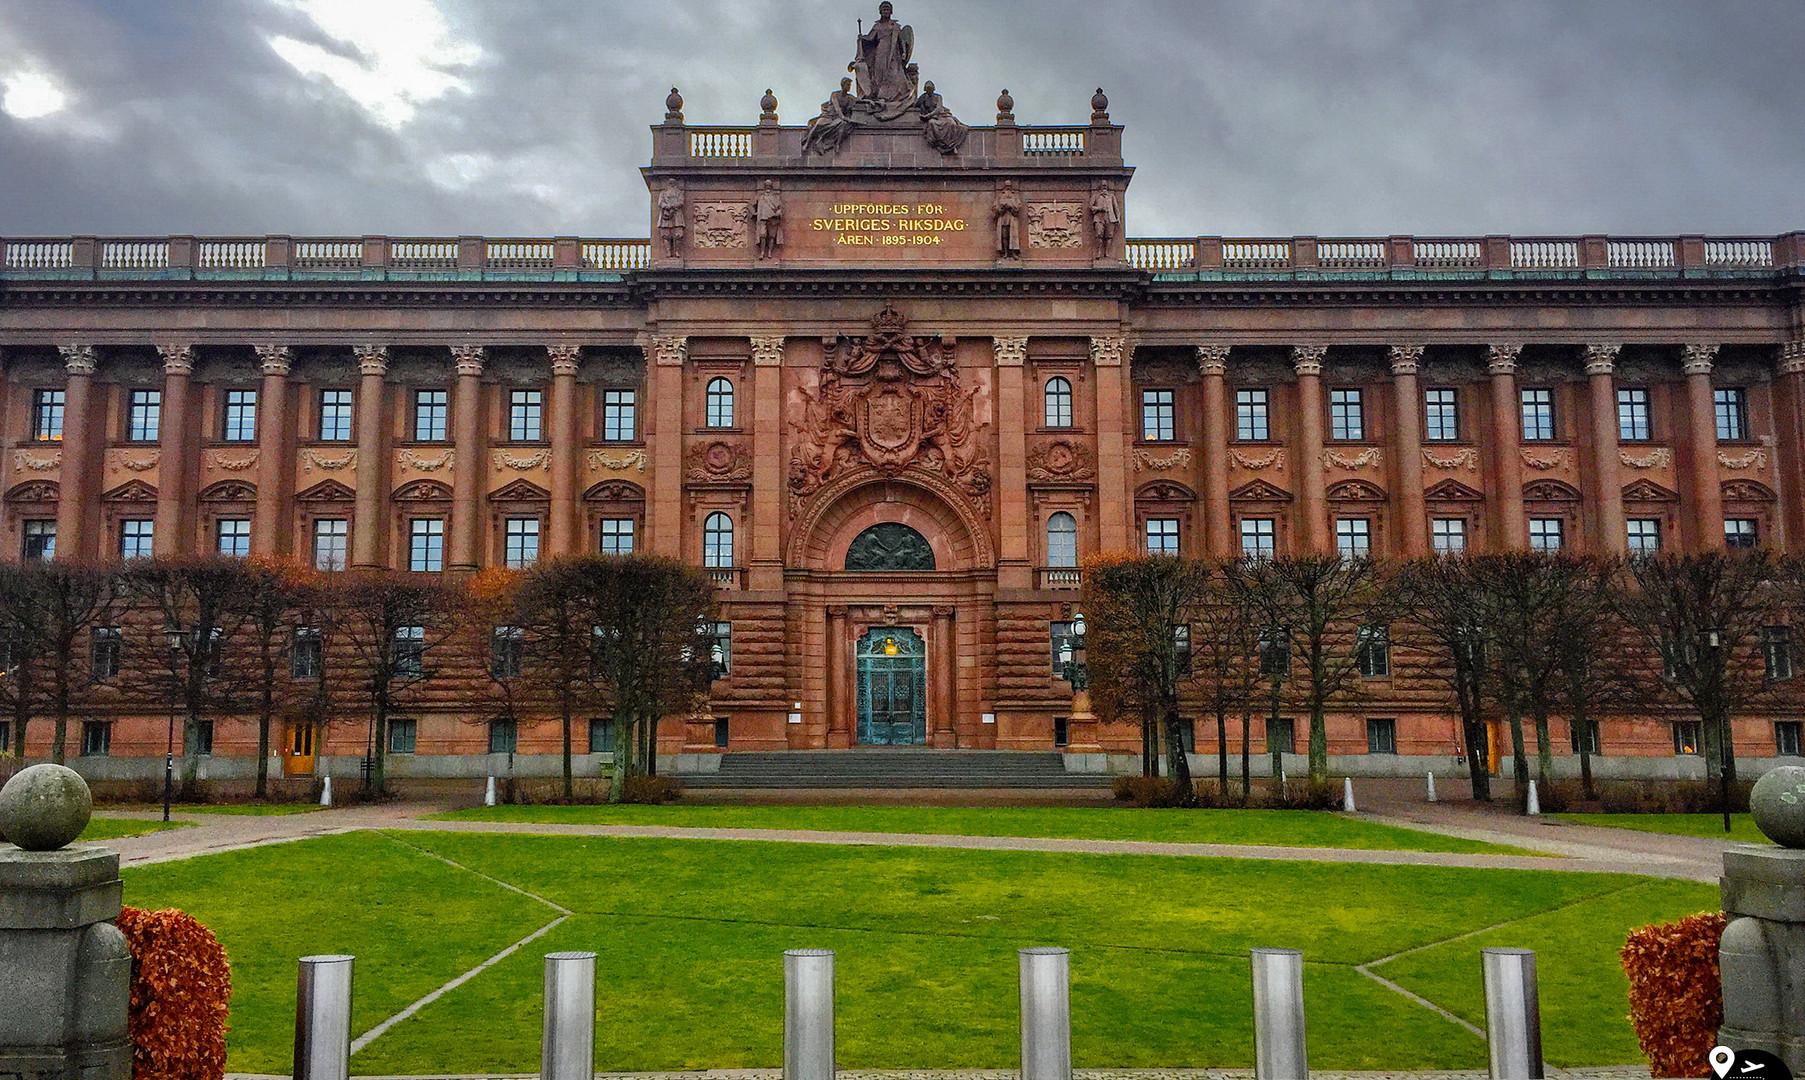 Шведский парламент (Риксдаг), Стокгольм